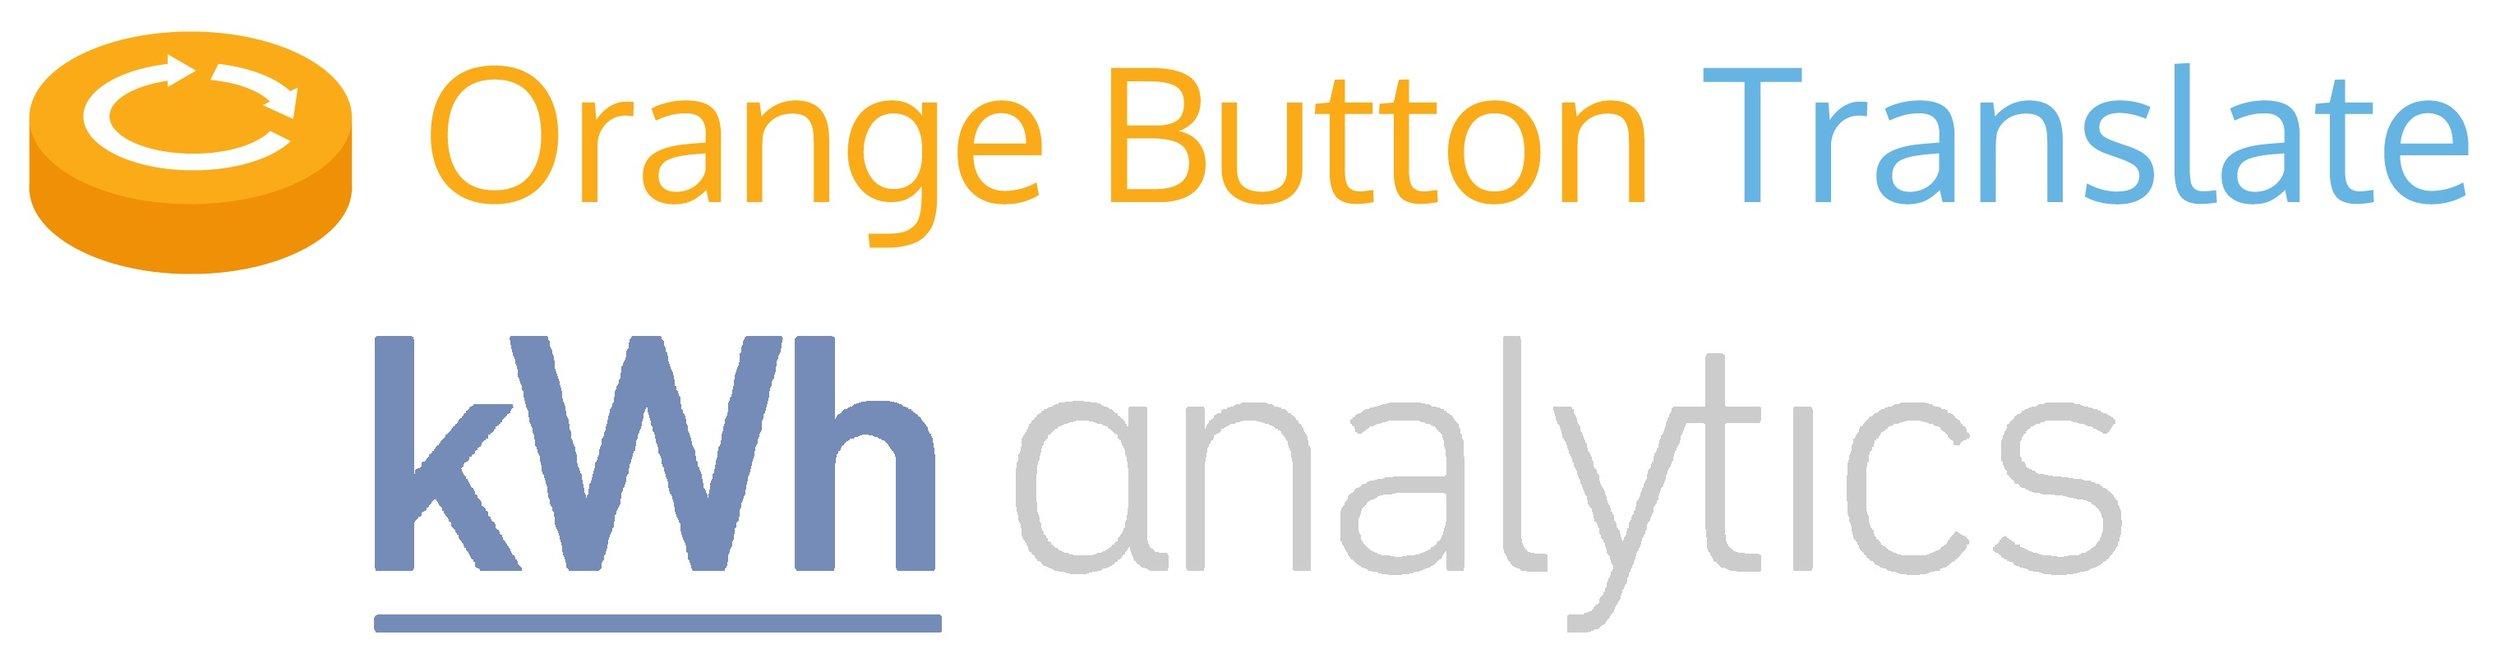 Orange-Button-Translate-by-kWh-Analytics.jpg